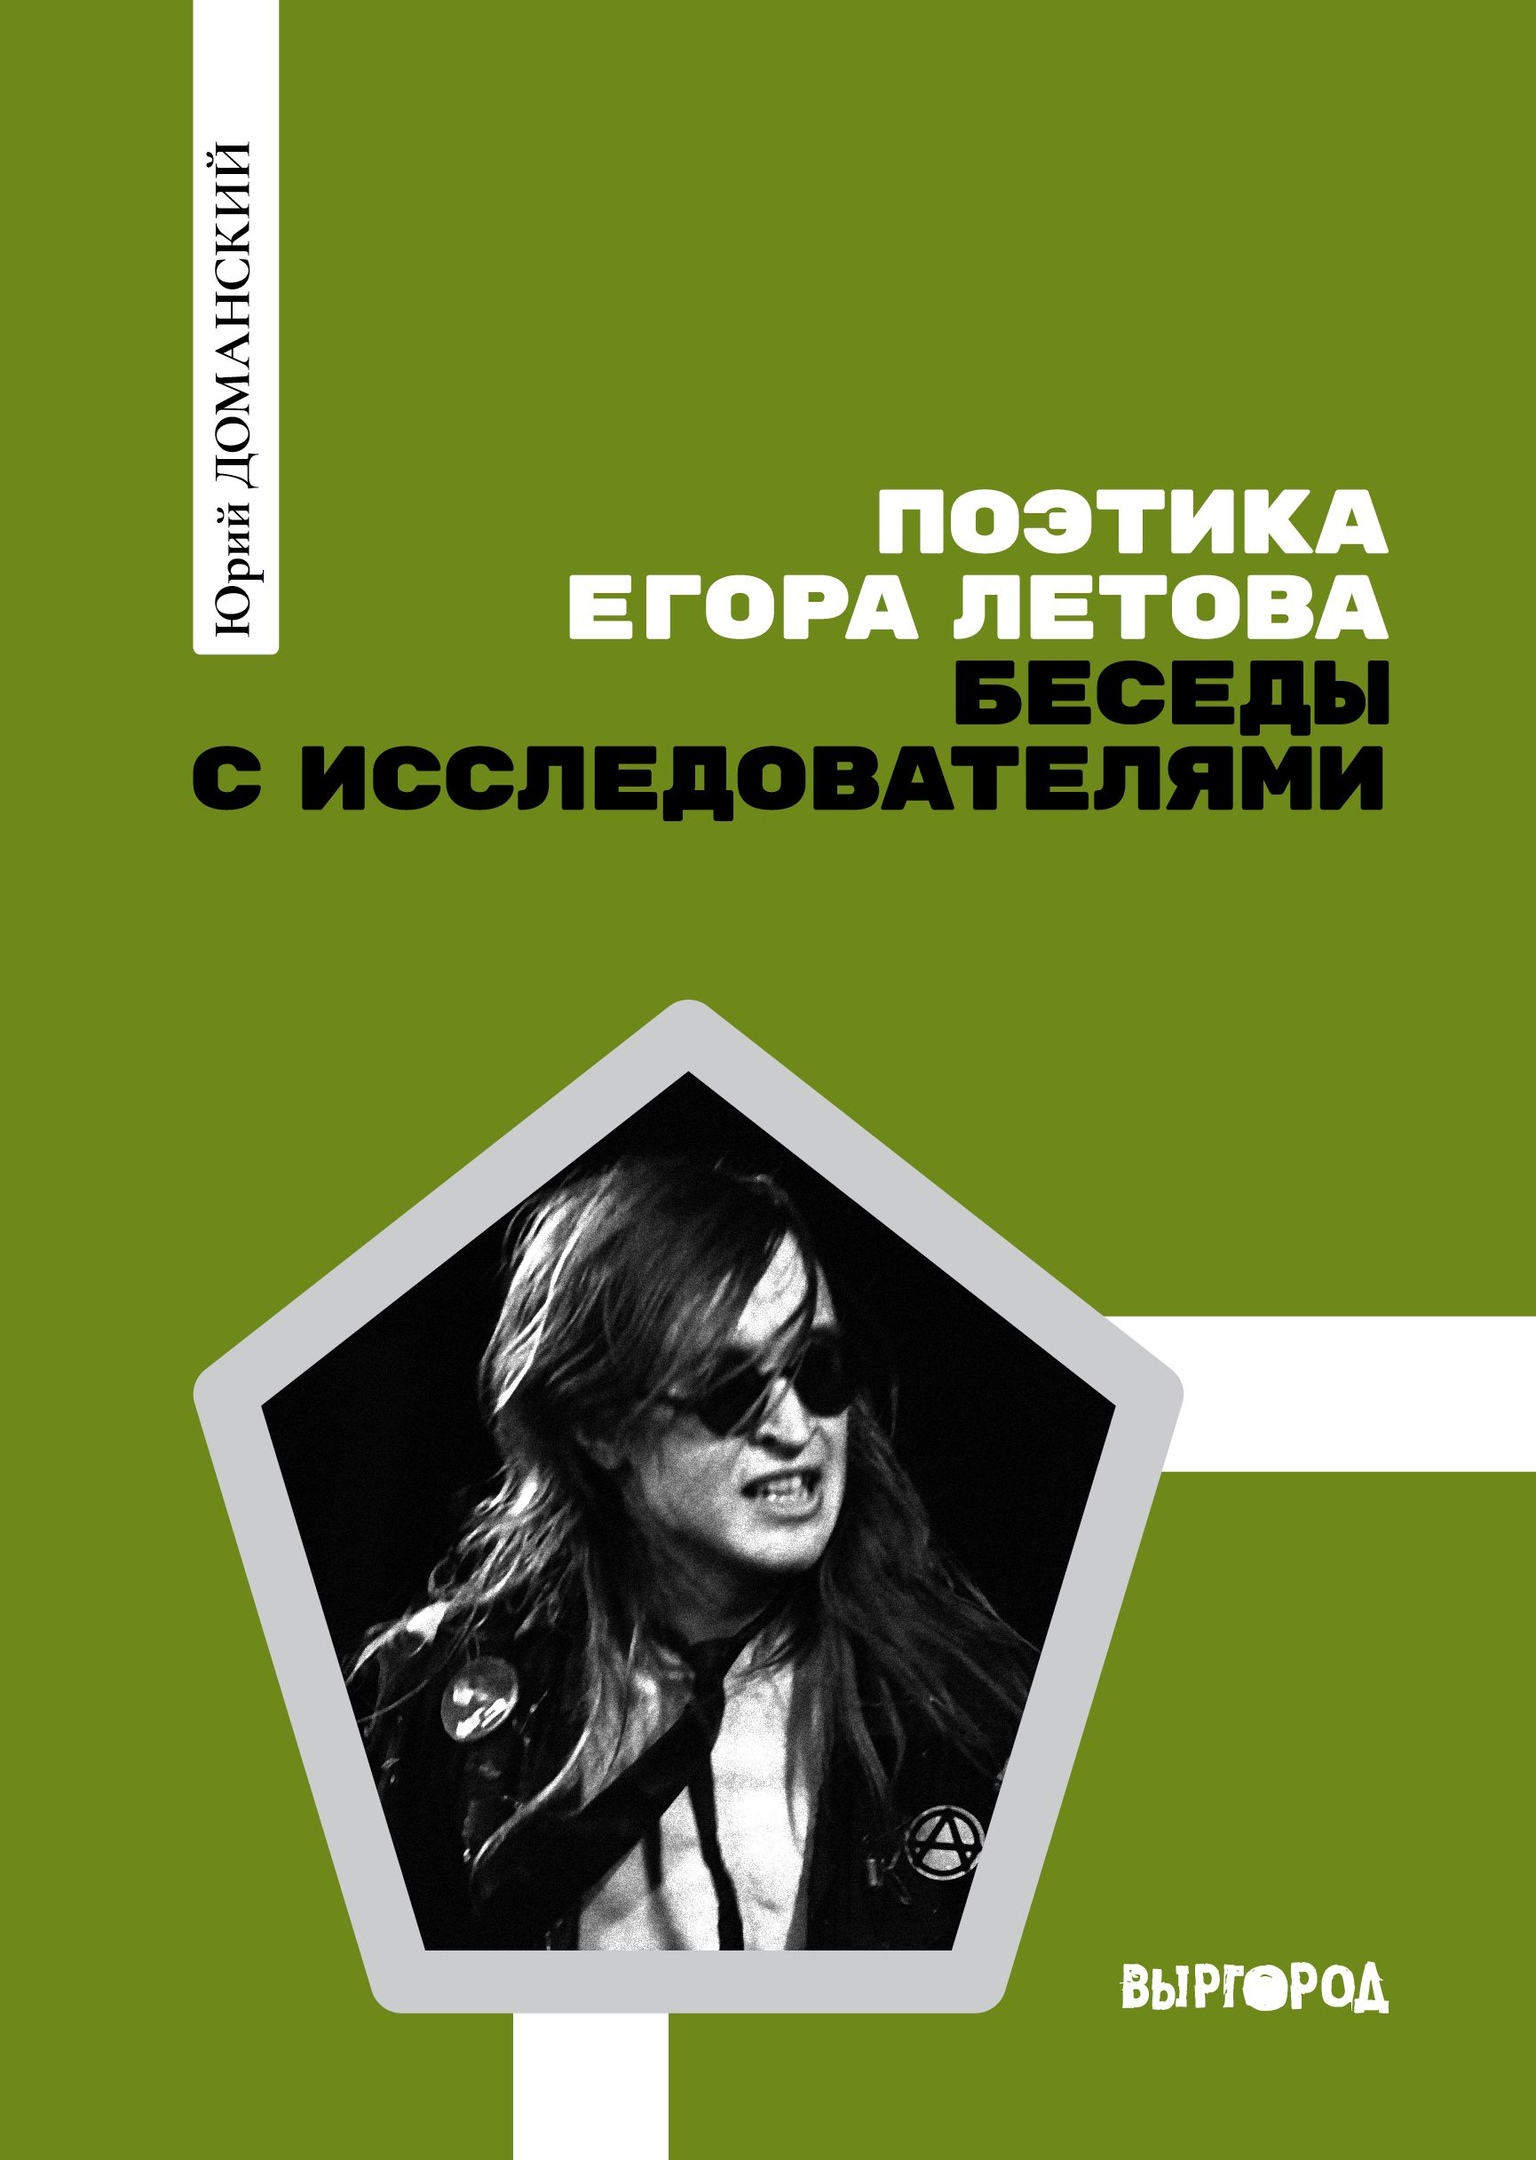 Легенда тверского филфака составил сборник бесед о Егоре Летове